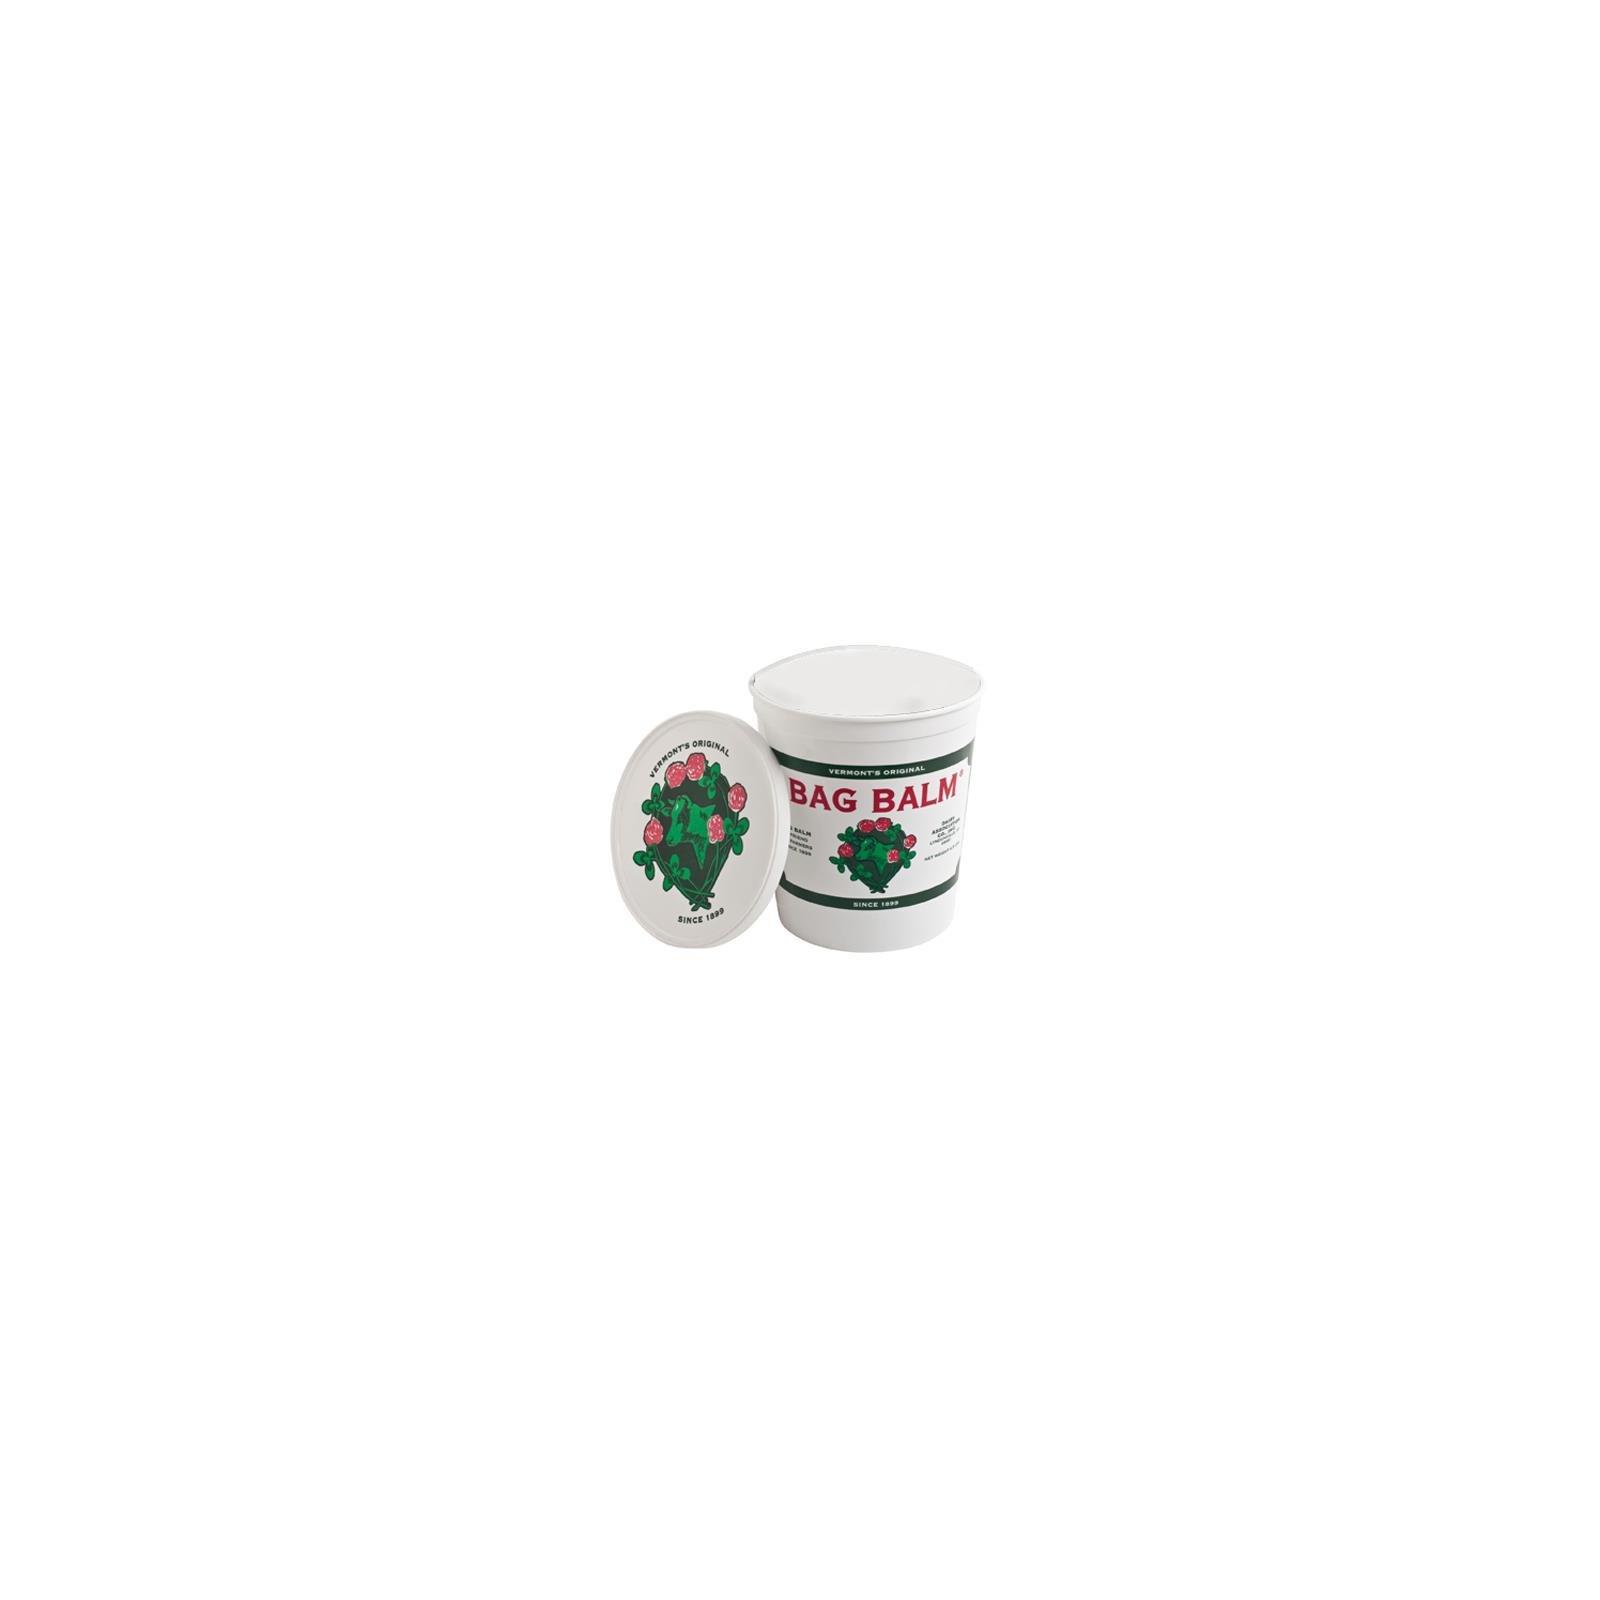 Dairy Association BBP 4.5LB Bag Balm Ointment - Quantity 6